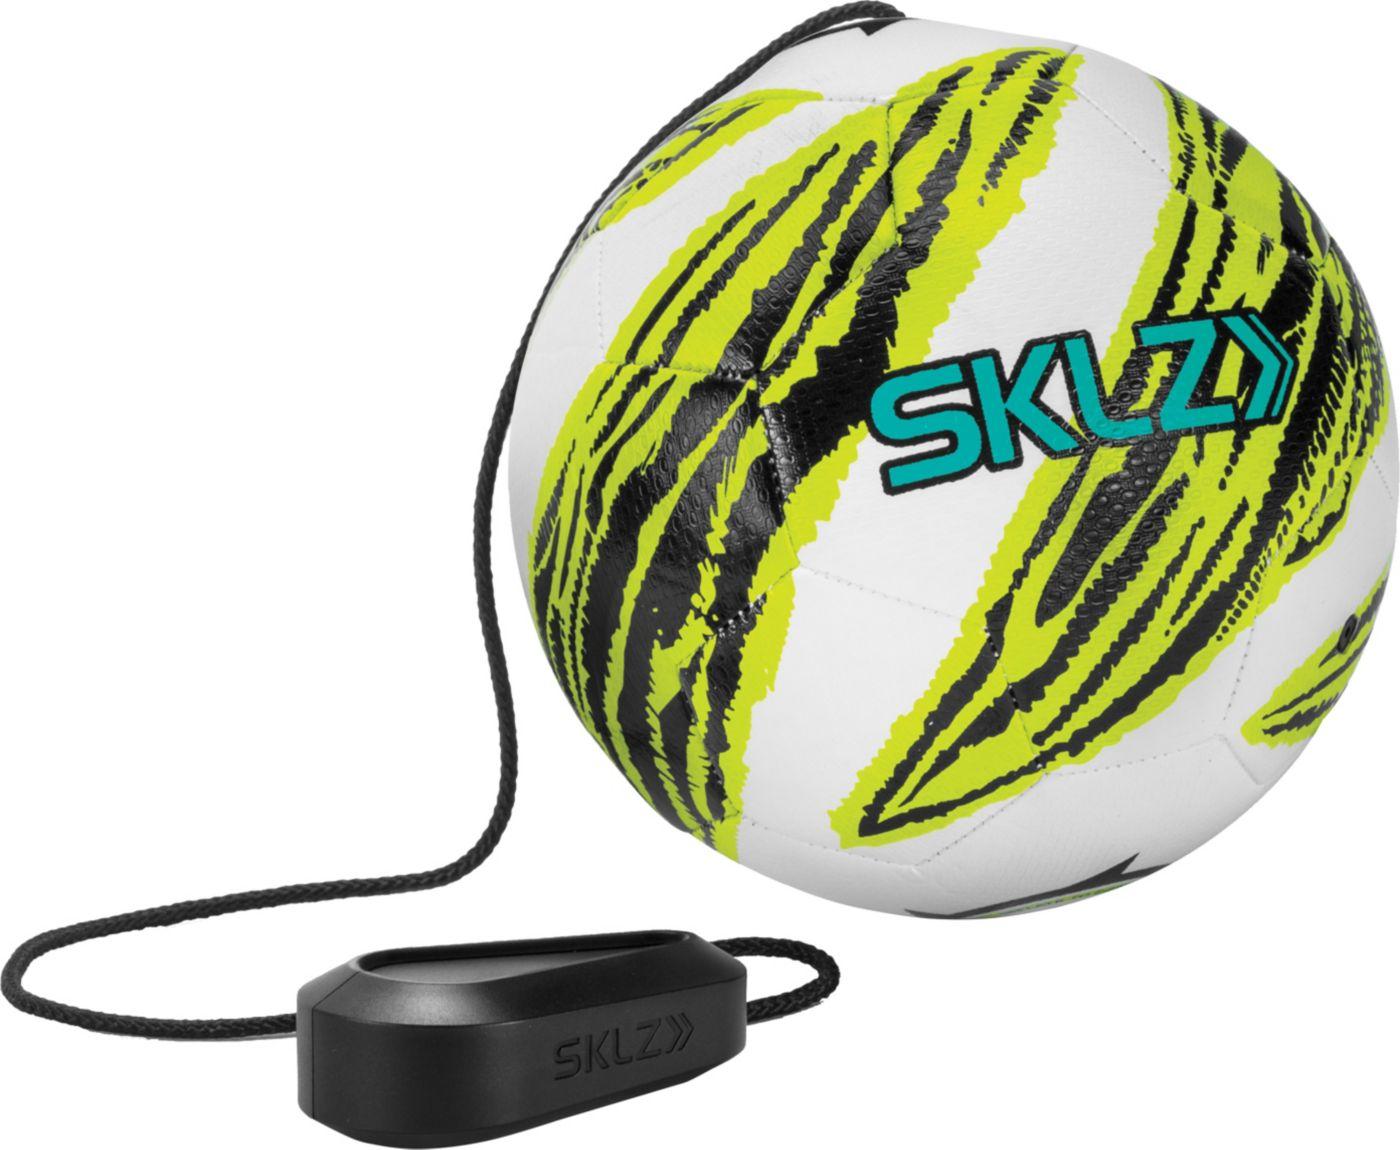 SKLZ Star Kick Mini Touch Soccer Trainer